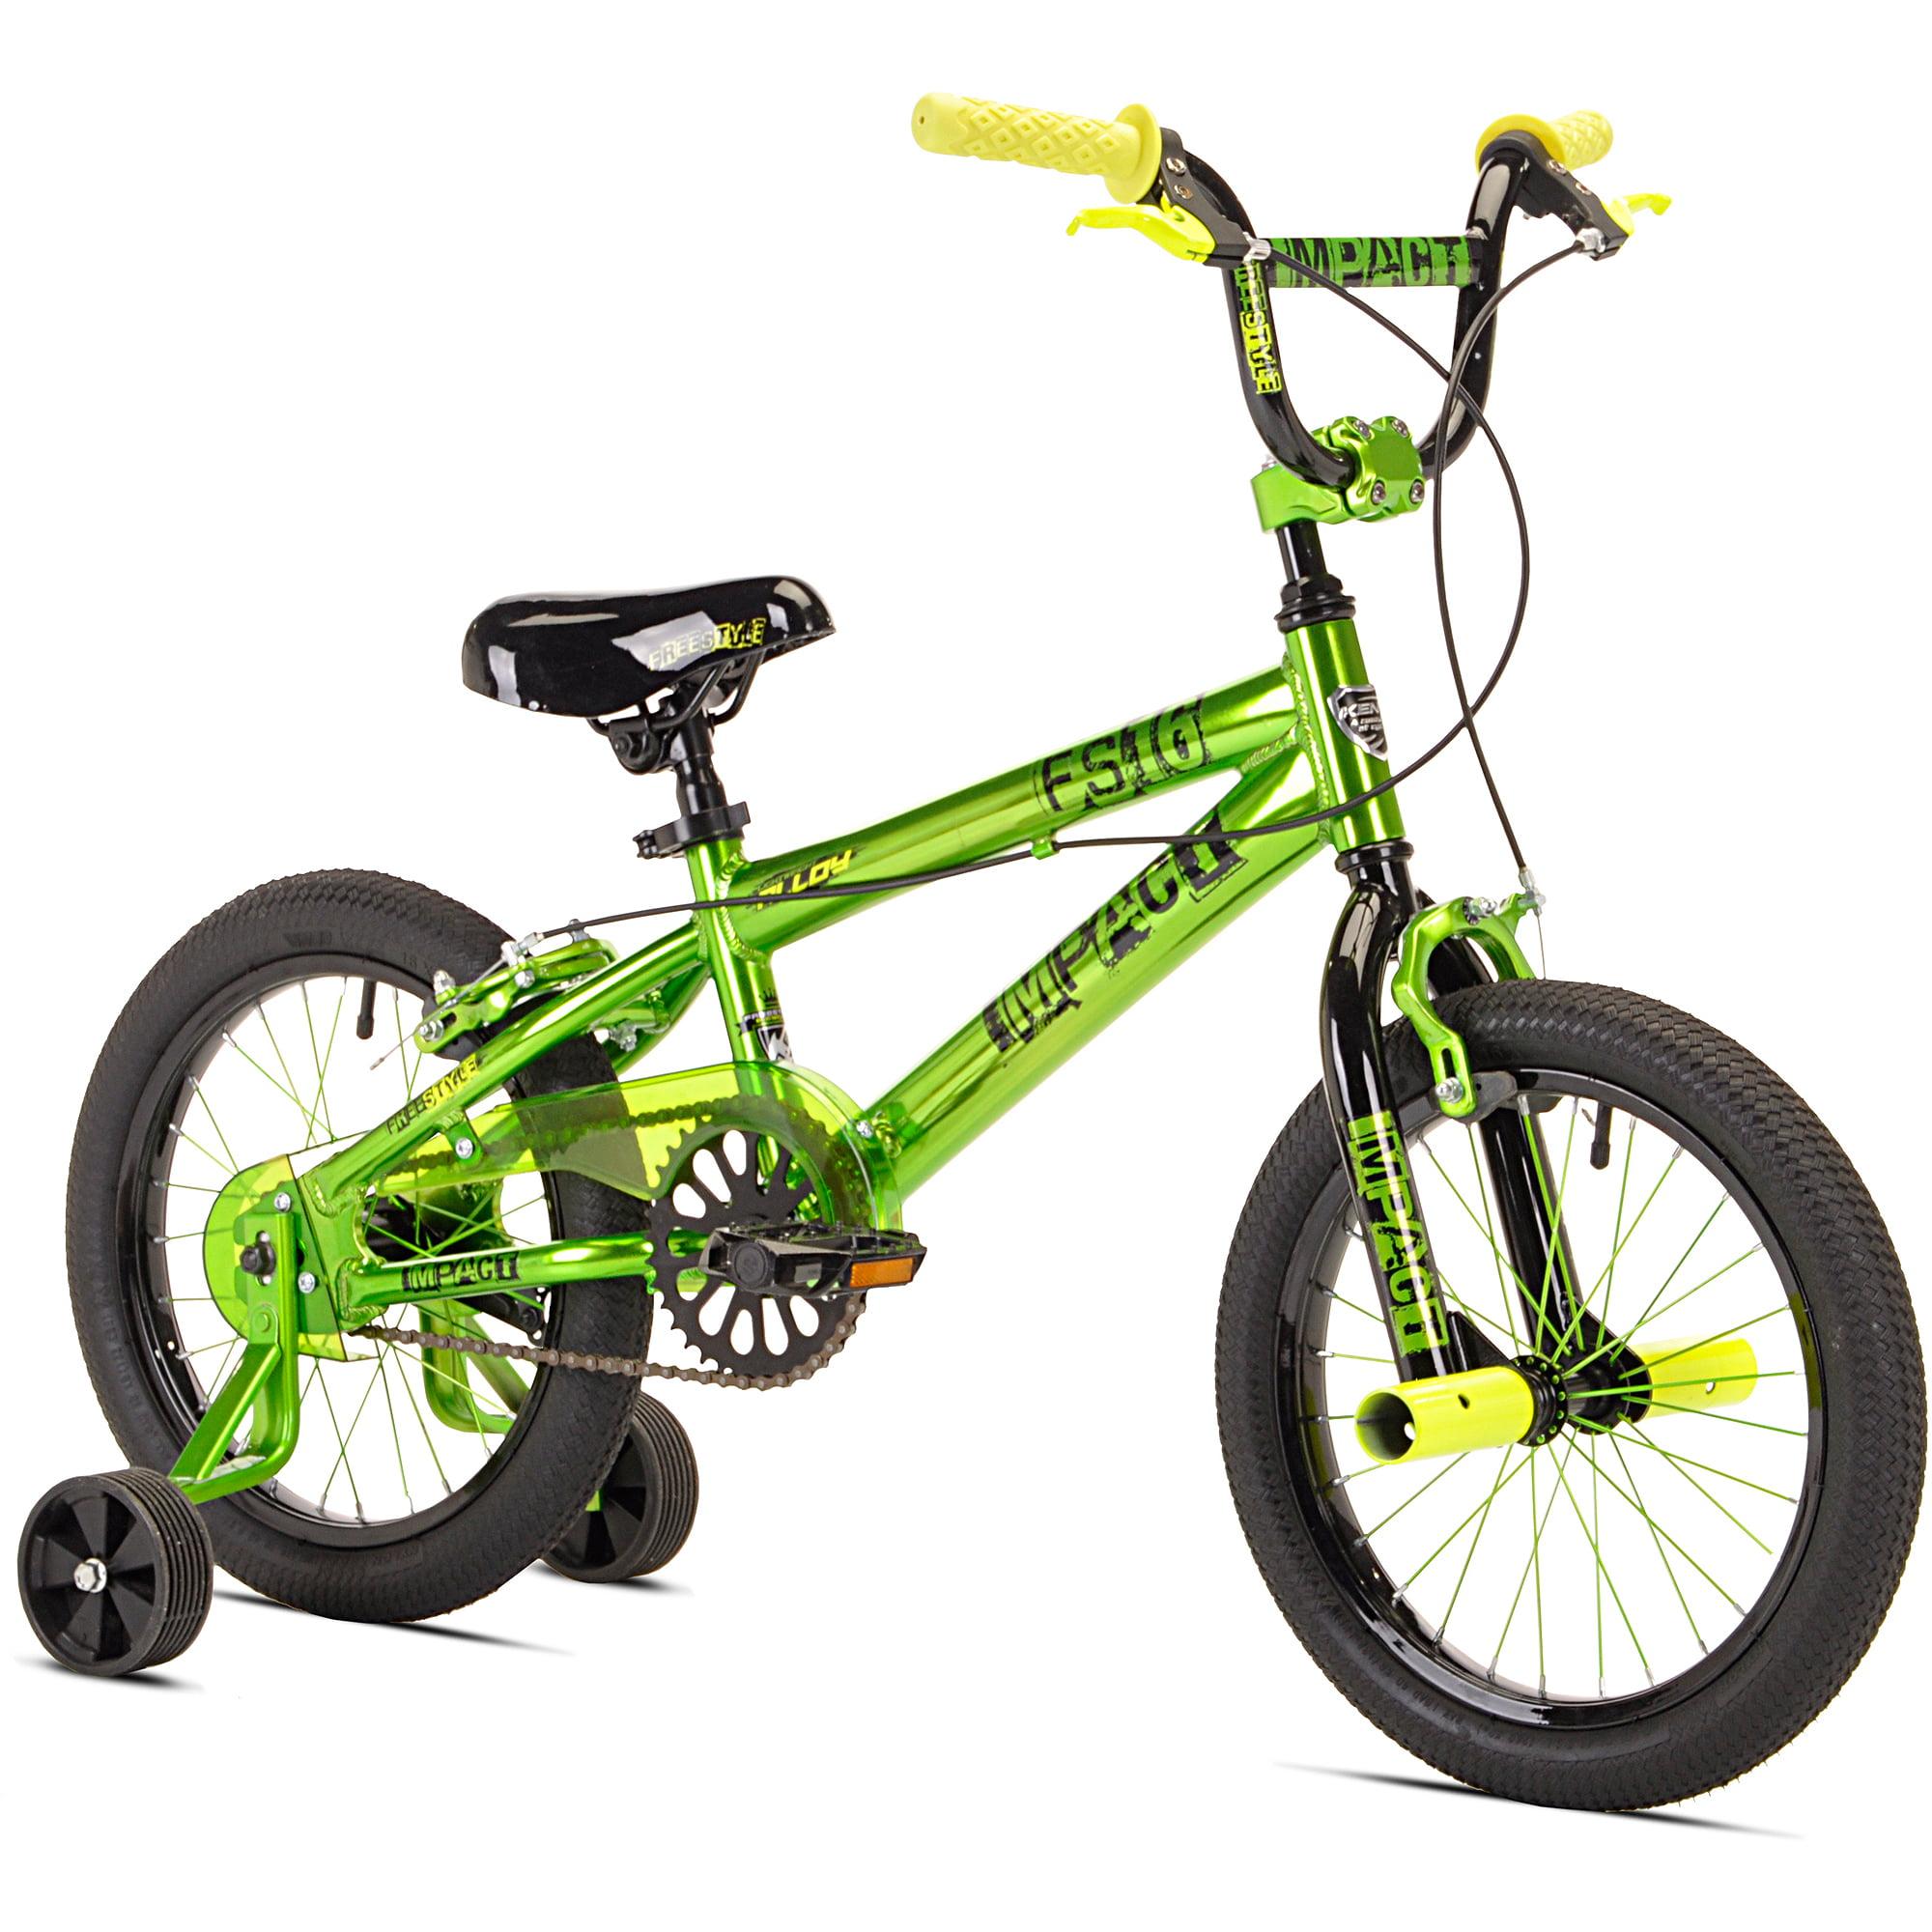 "16"" Kent Impact Boys' Bike, Green"